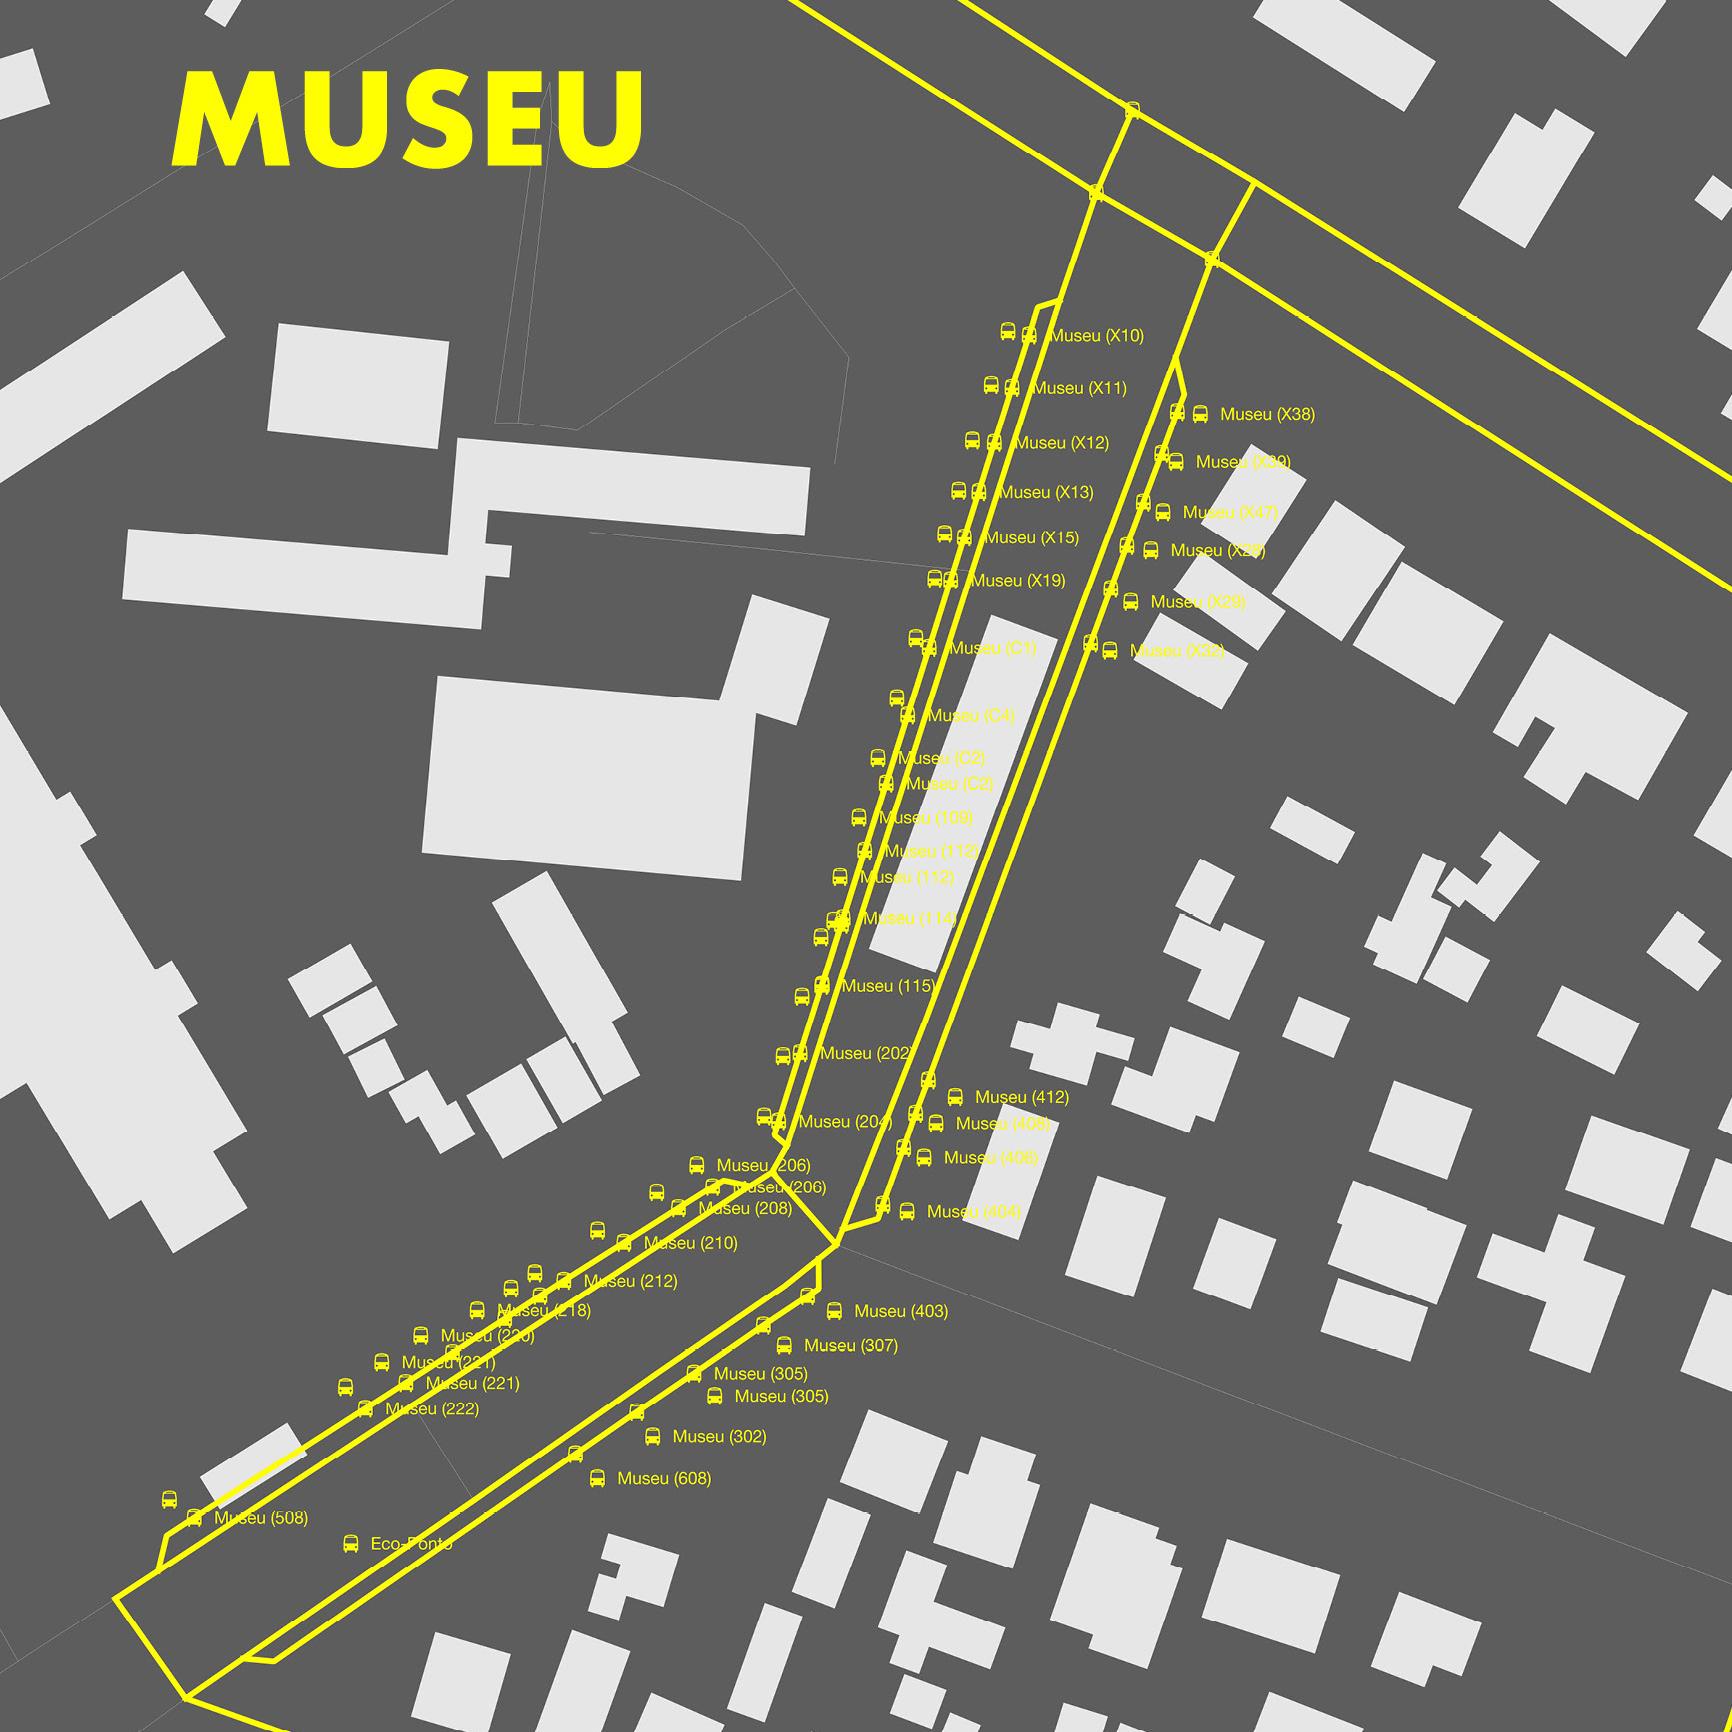 terminal do museu